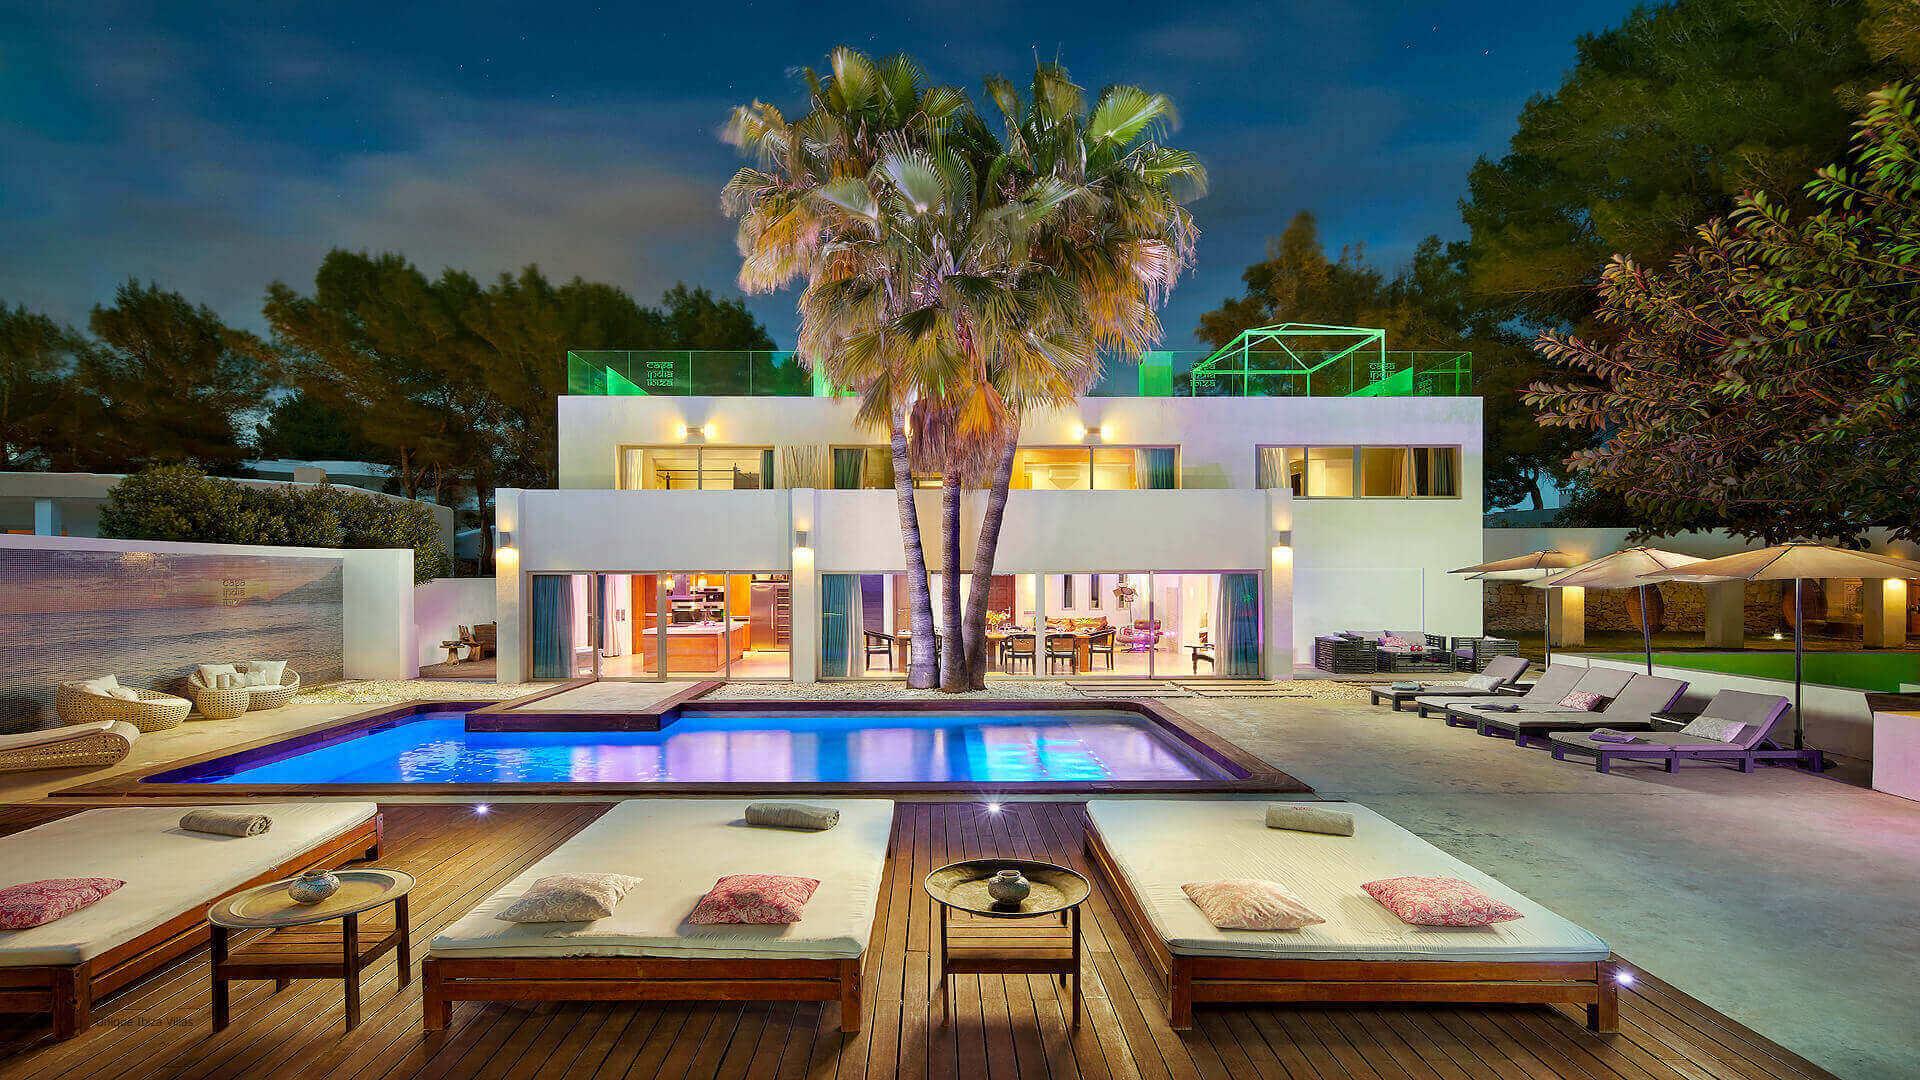 Casa India Ibiza 1 Roca Llisa